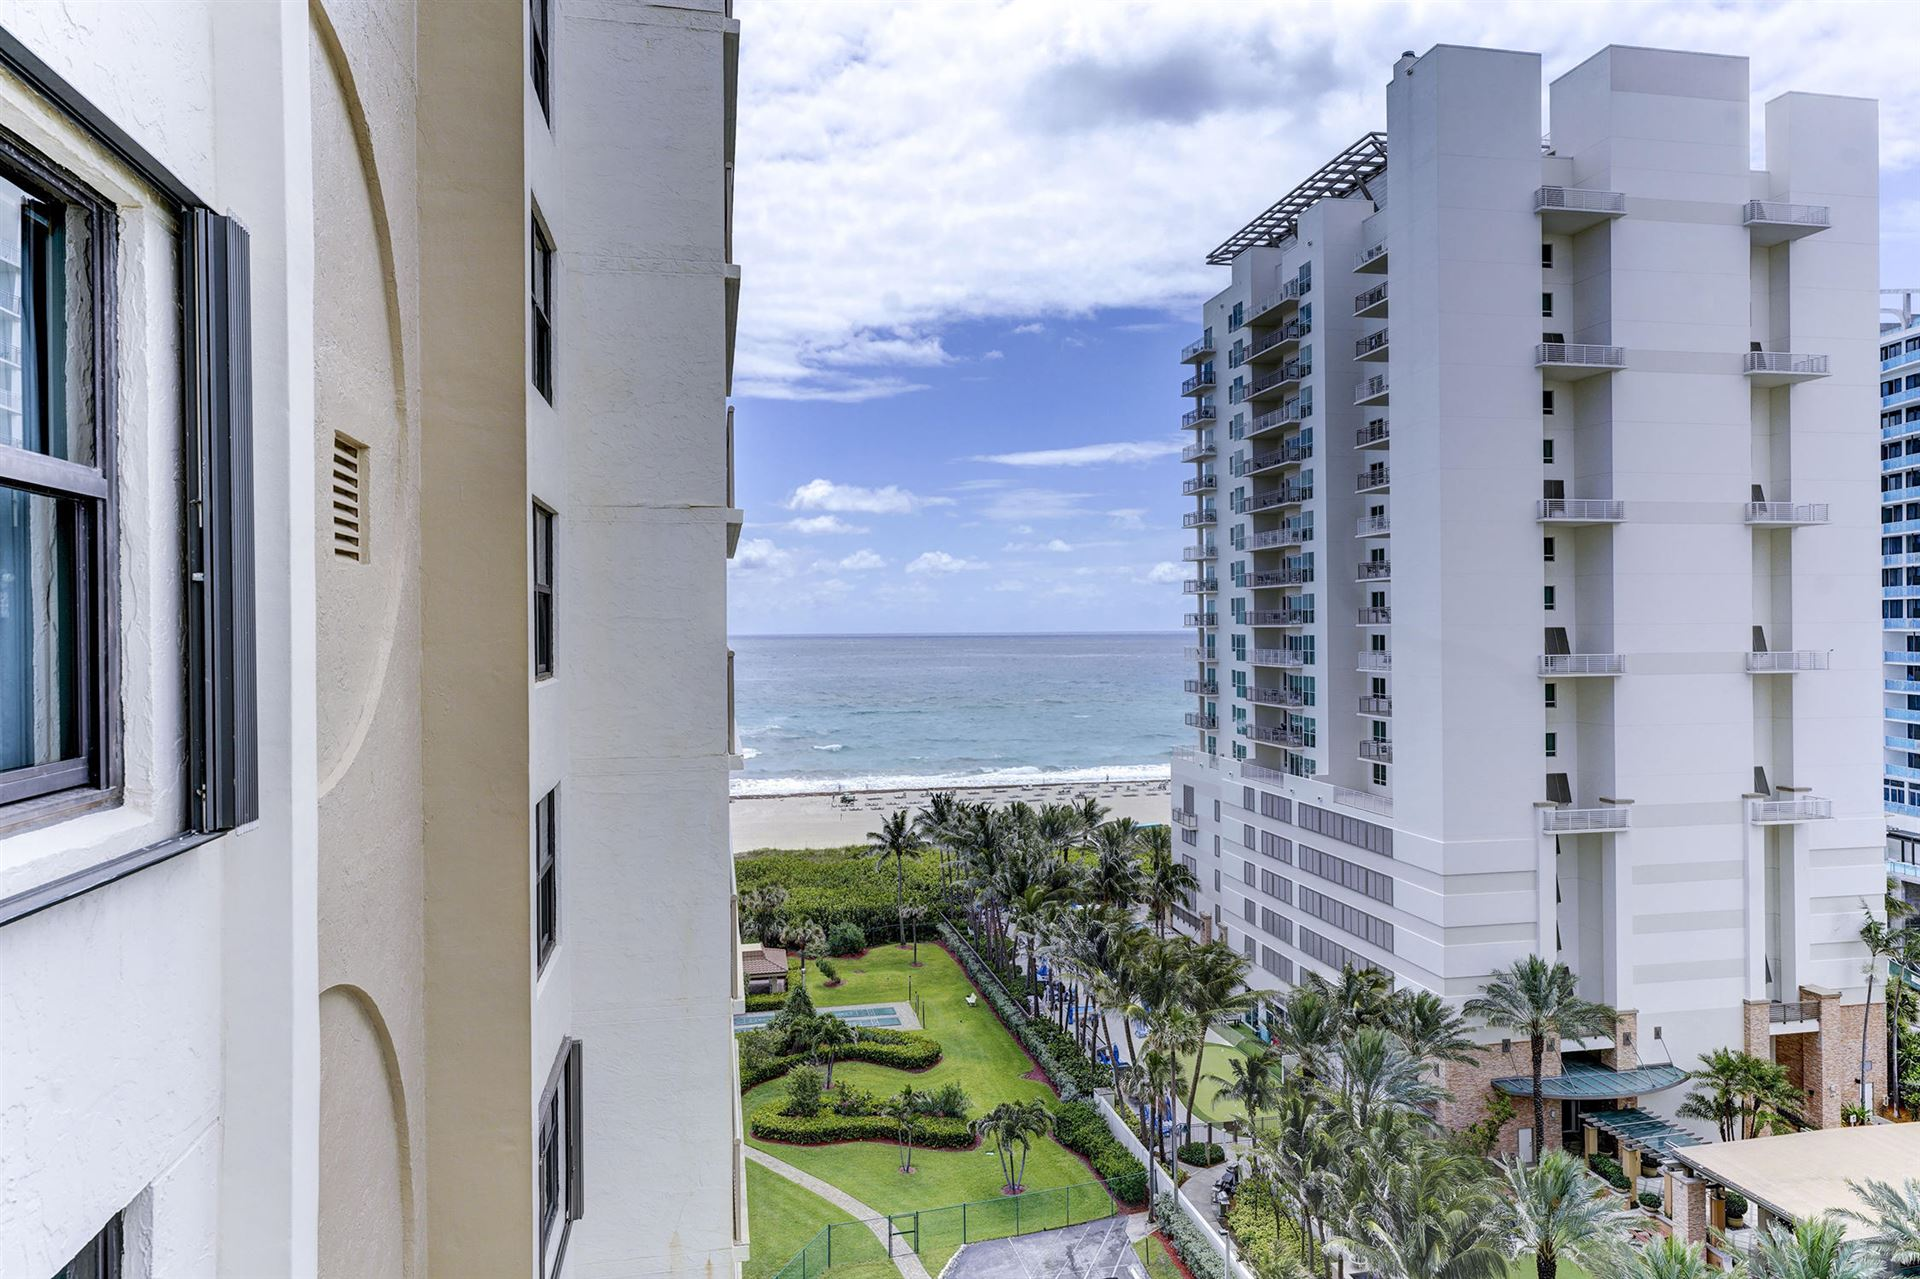 Photo of 3400 N Ocean Drive #1206, Riviera Beach, FL 33404 (MLS # RX-10715461)